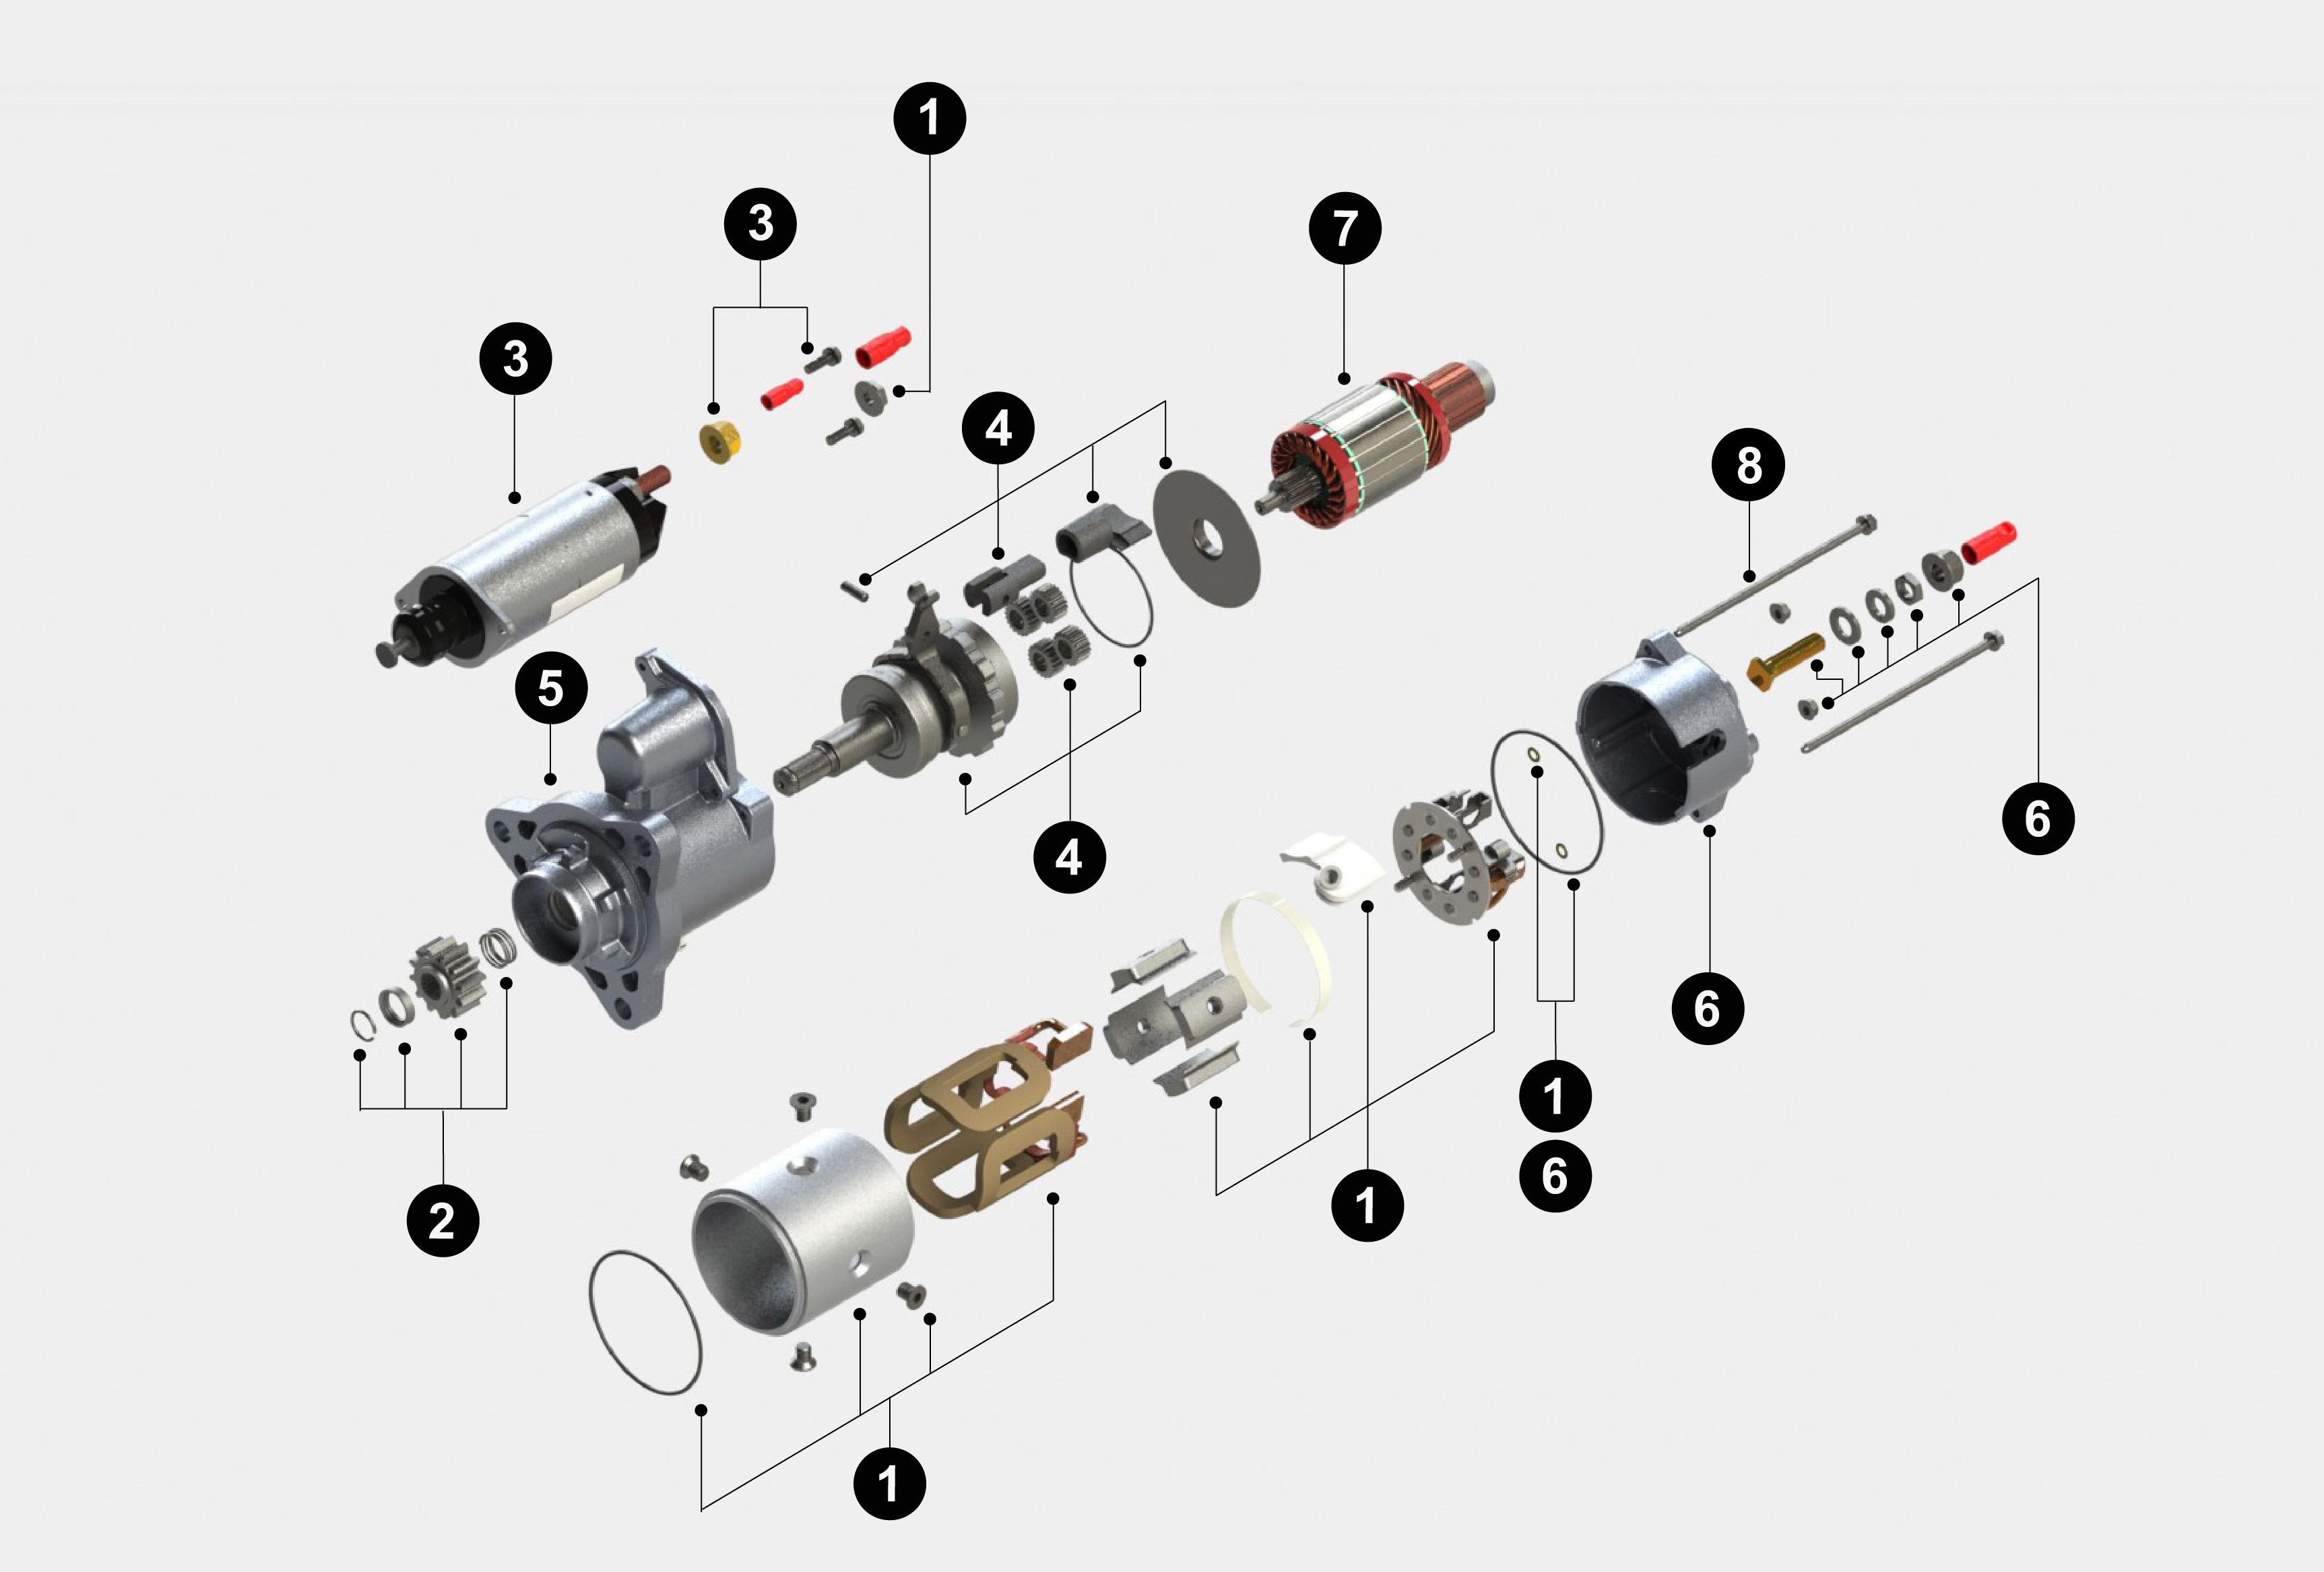 John Deere L120 Pto Clutch Wiring Diagram moreover Regrecconversion likewise 566468459354036294 moreover Perkins Diesel Engine Wiring For Alternator also 69 Camaro Alternator Wiring Diagram. on gm 12v alternator wiring diagram